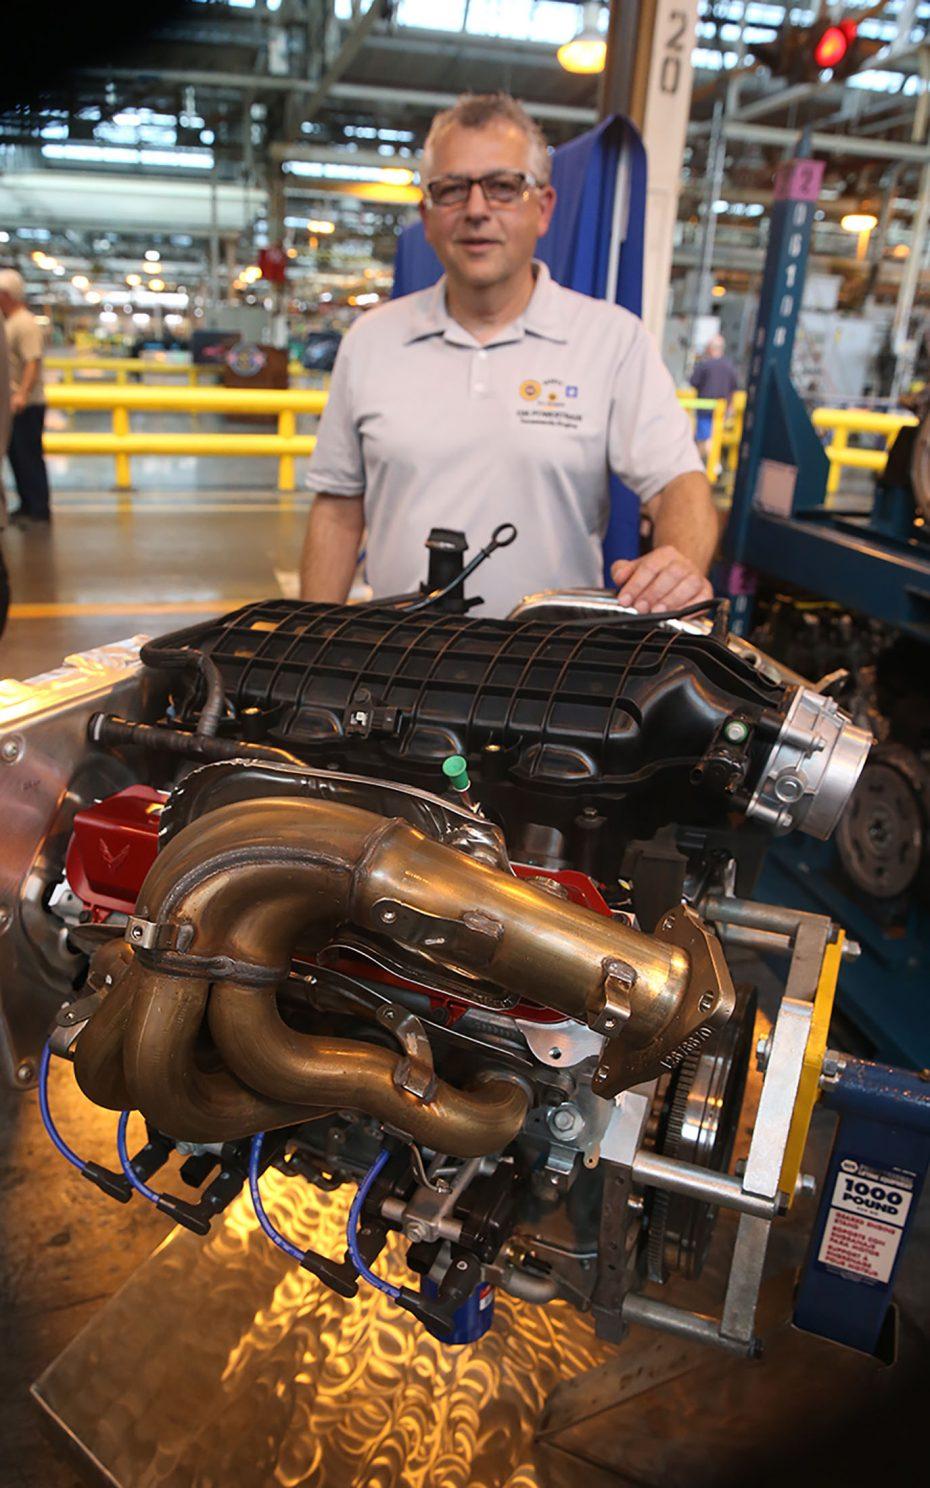 Engines made in Tonawanda will power new 'value' Corvette – The